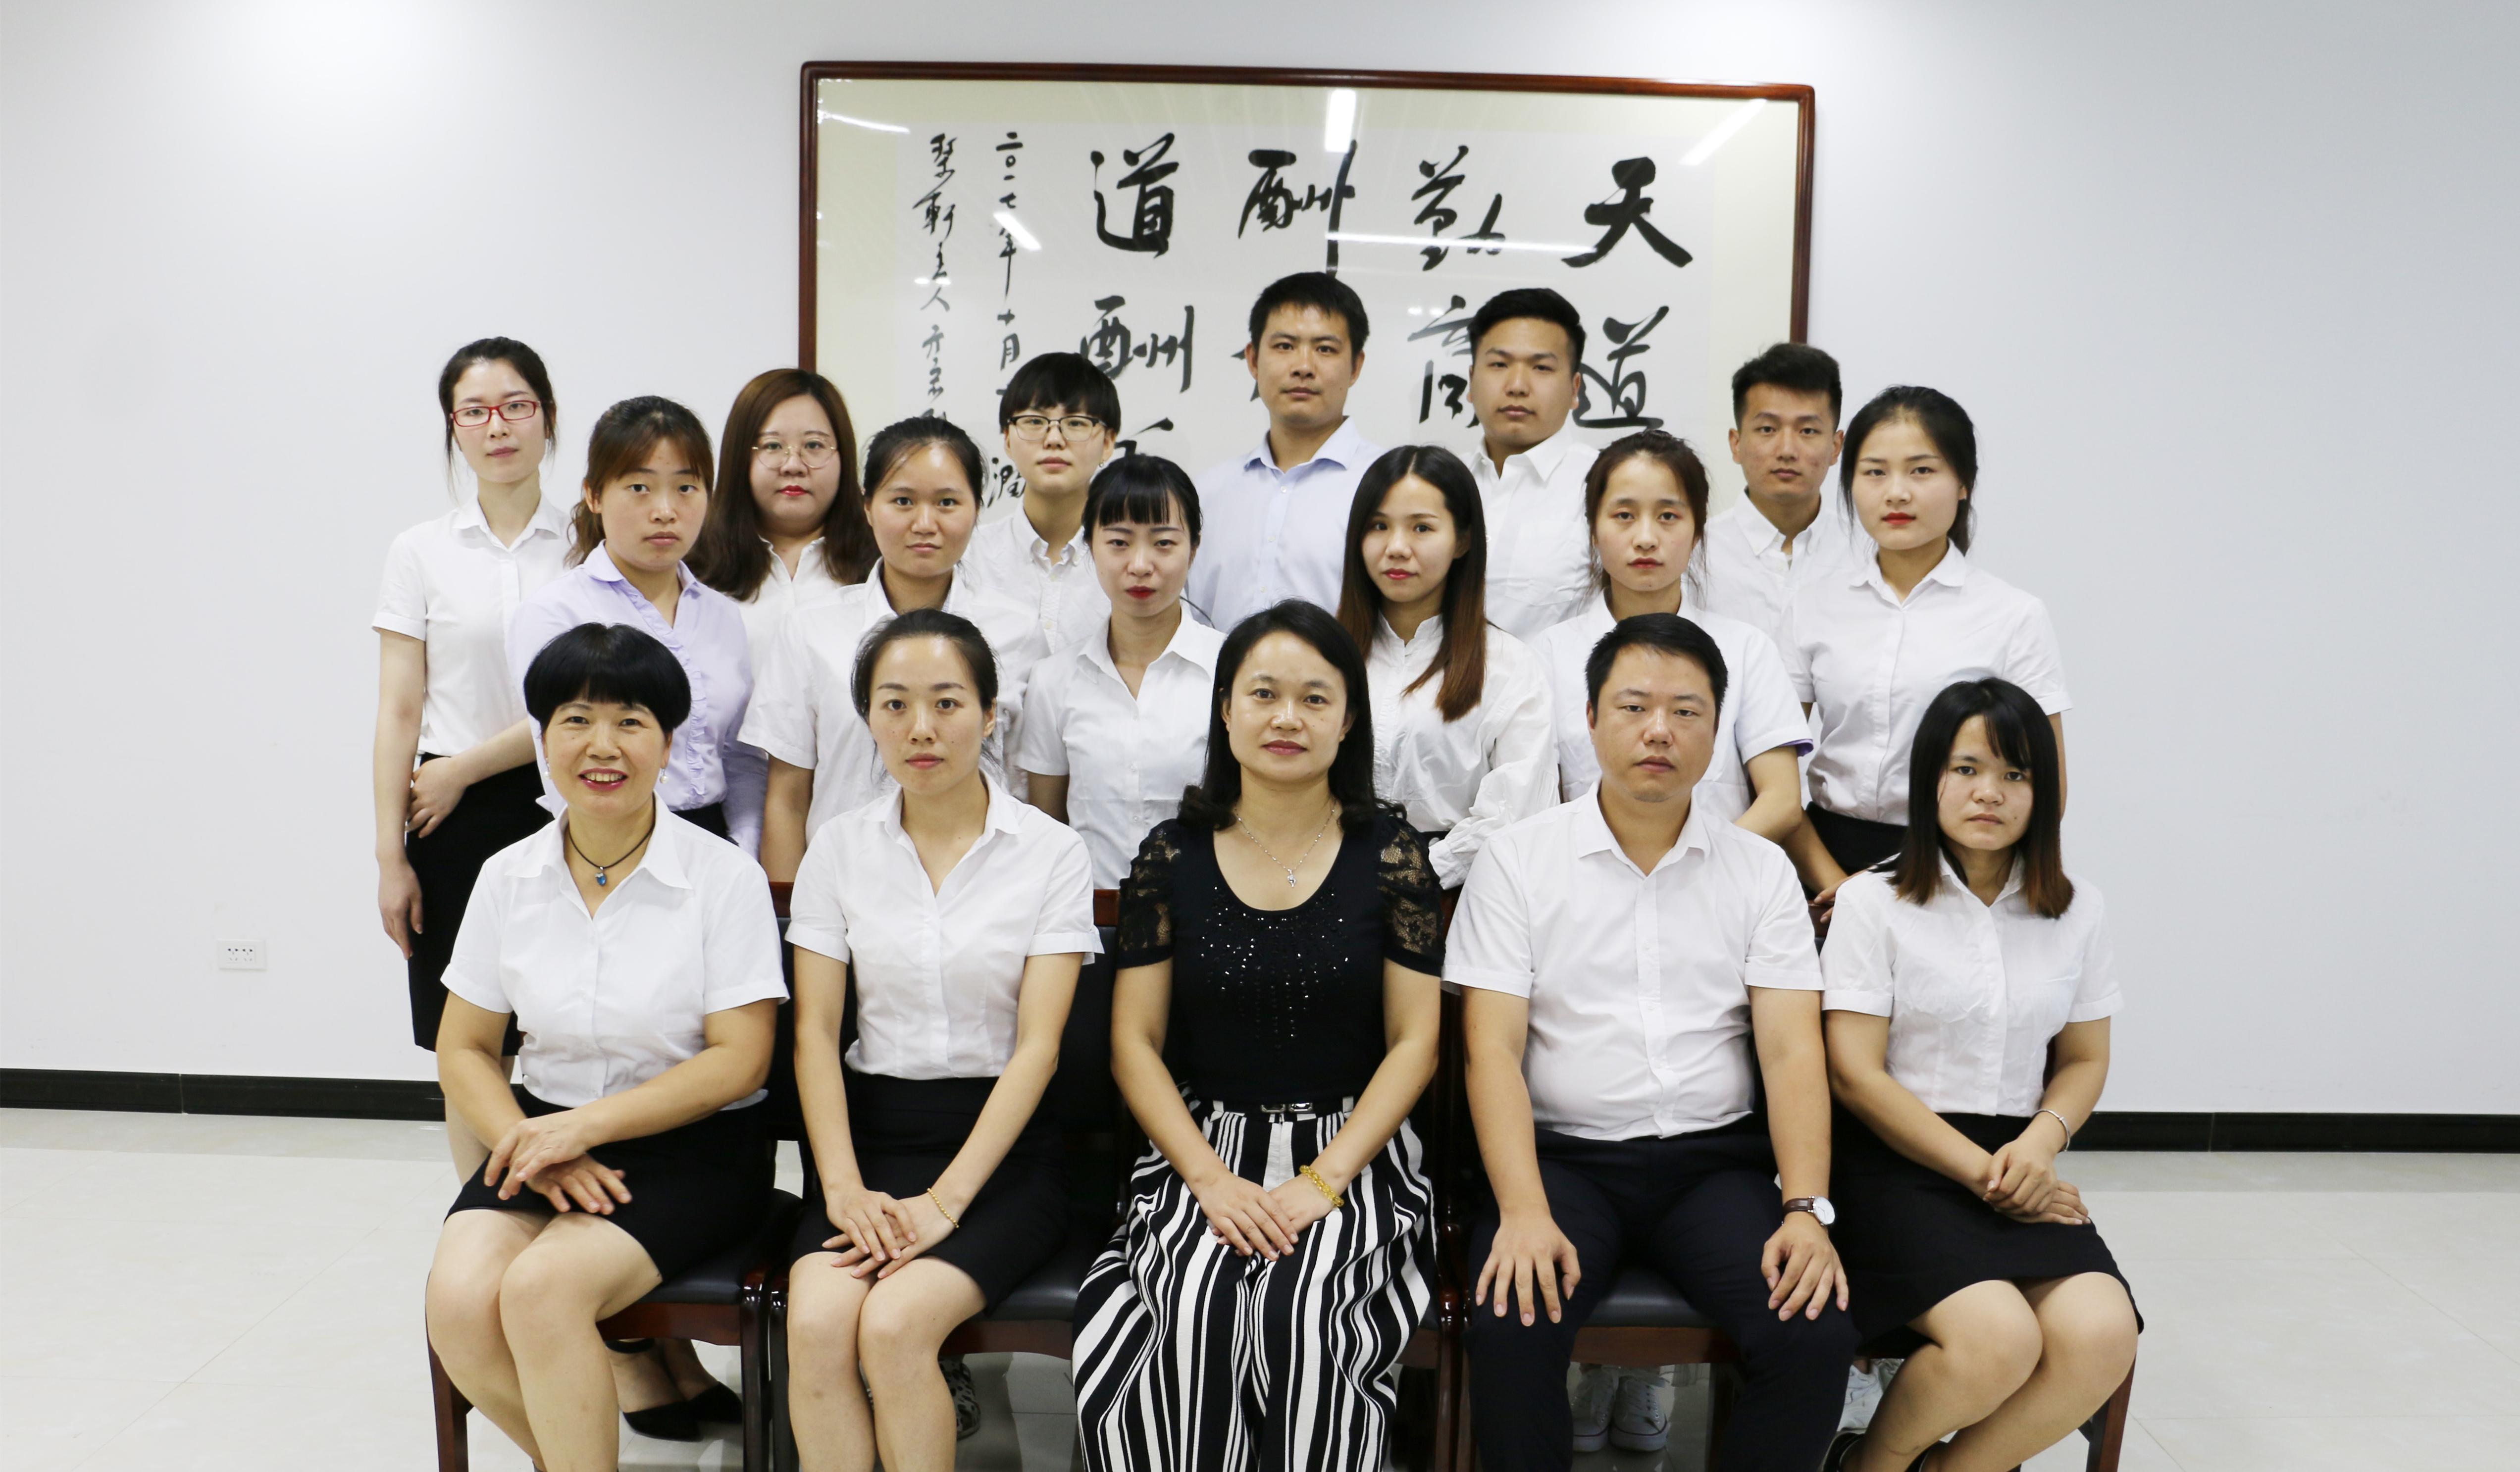 bob官网登录职校教师合影